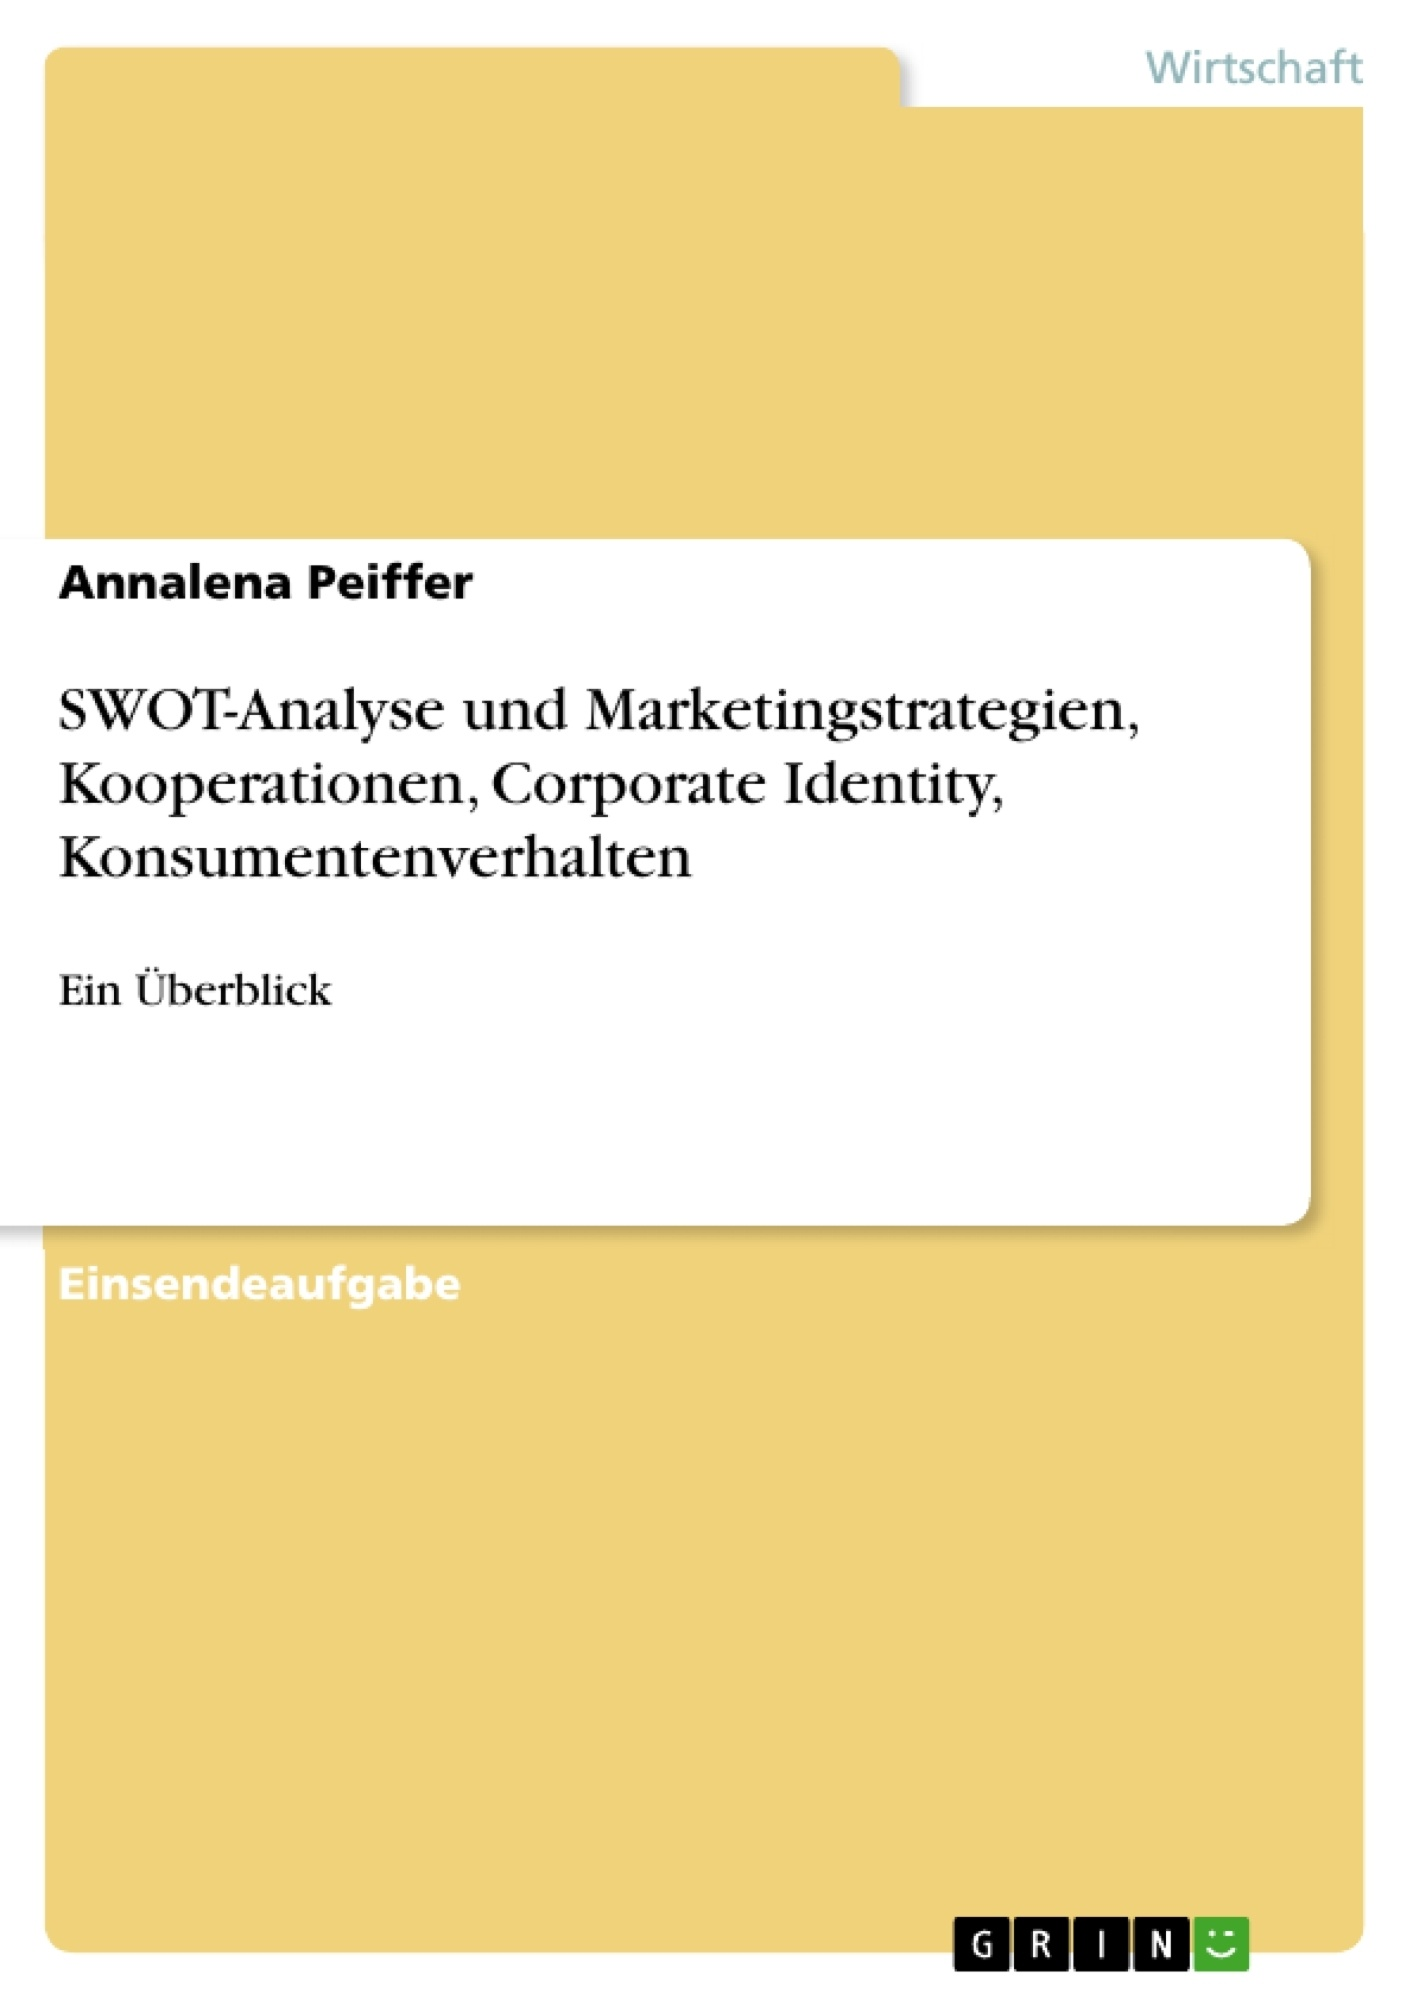 Titel: SWOT-Analyse und Marketingstrategien, Kooperationen, Corporate Identity, Konsumentenverhalten